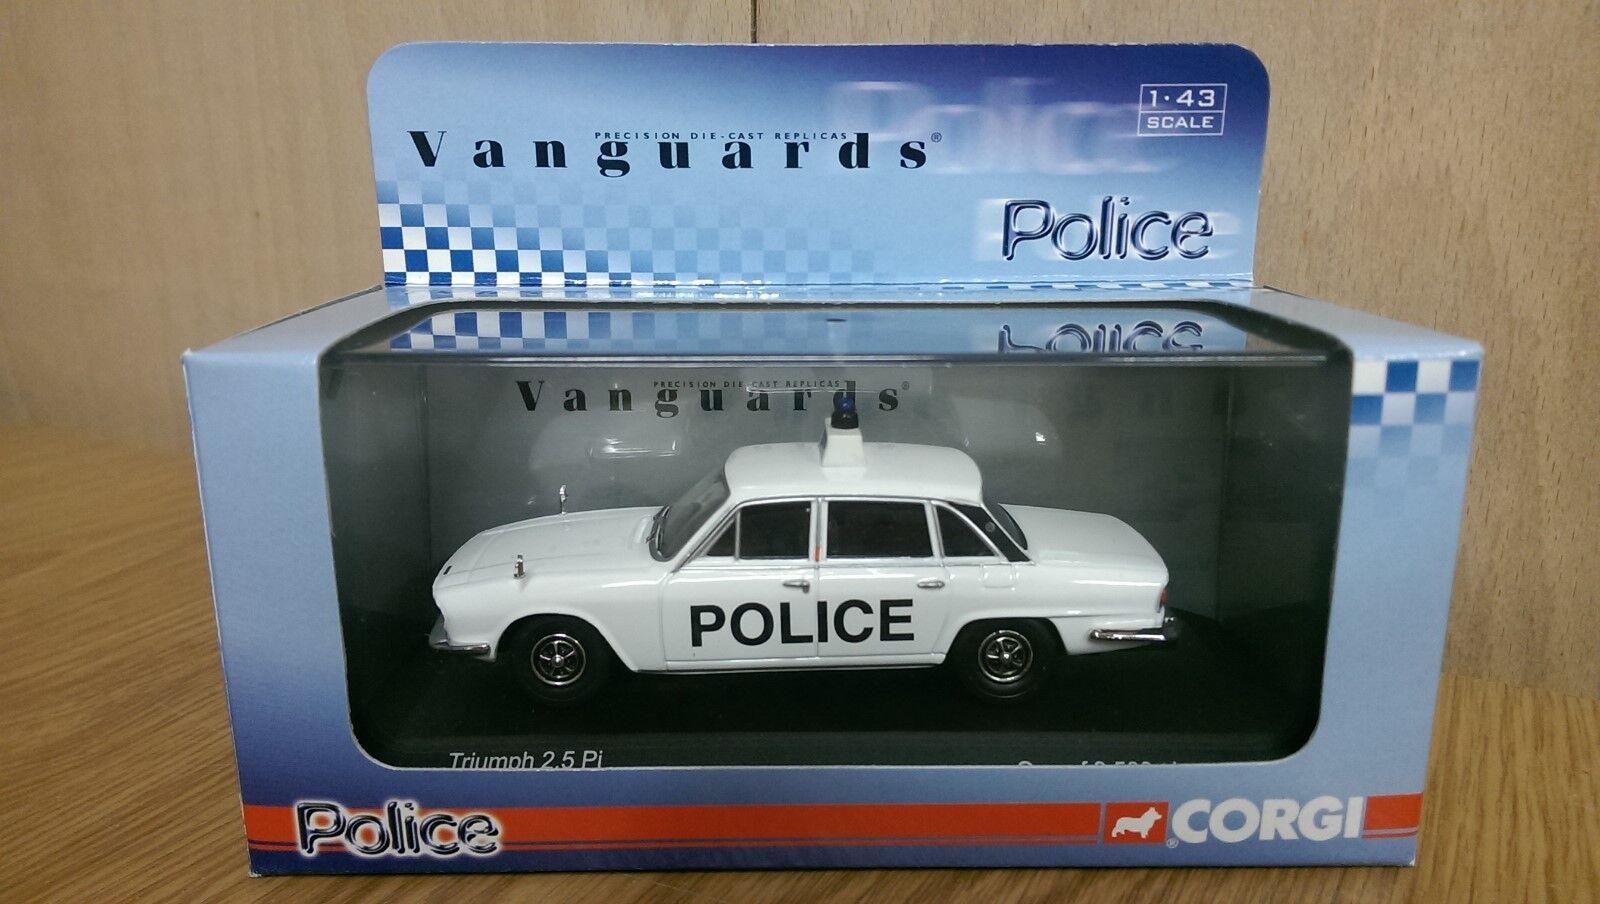 Corgi Vanguards VA08207 Triumph 2.5Pi Dorset Police Limited Edition of 3500